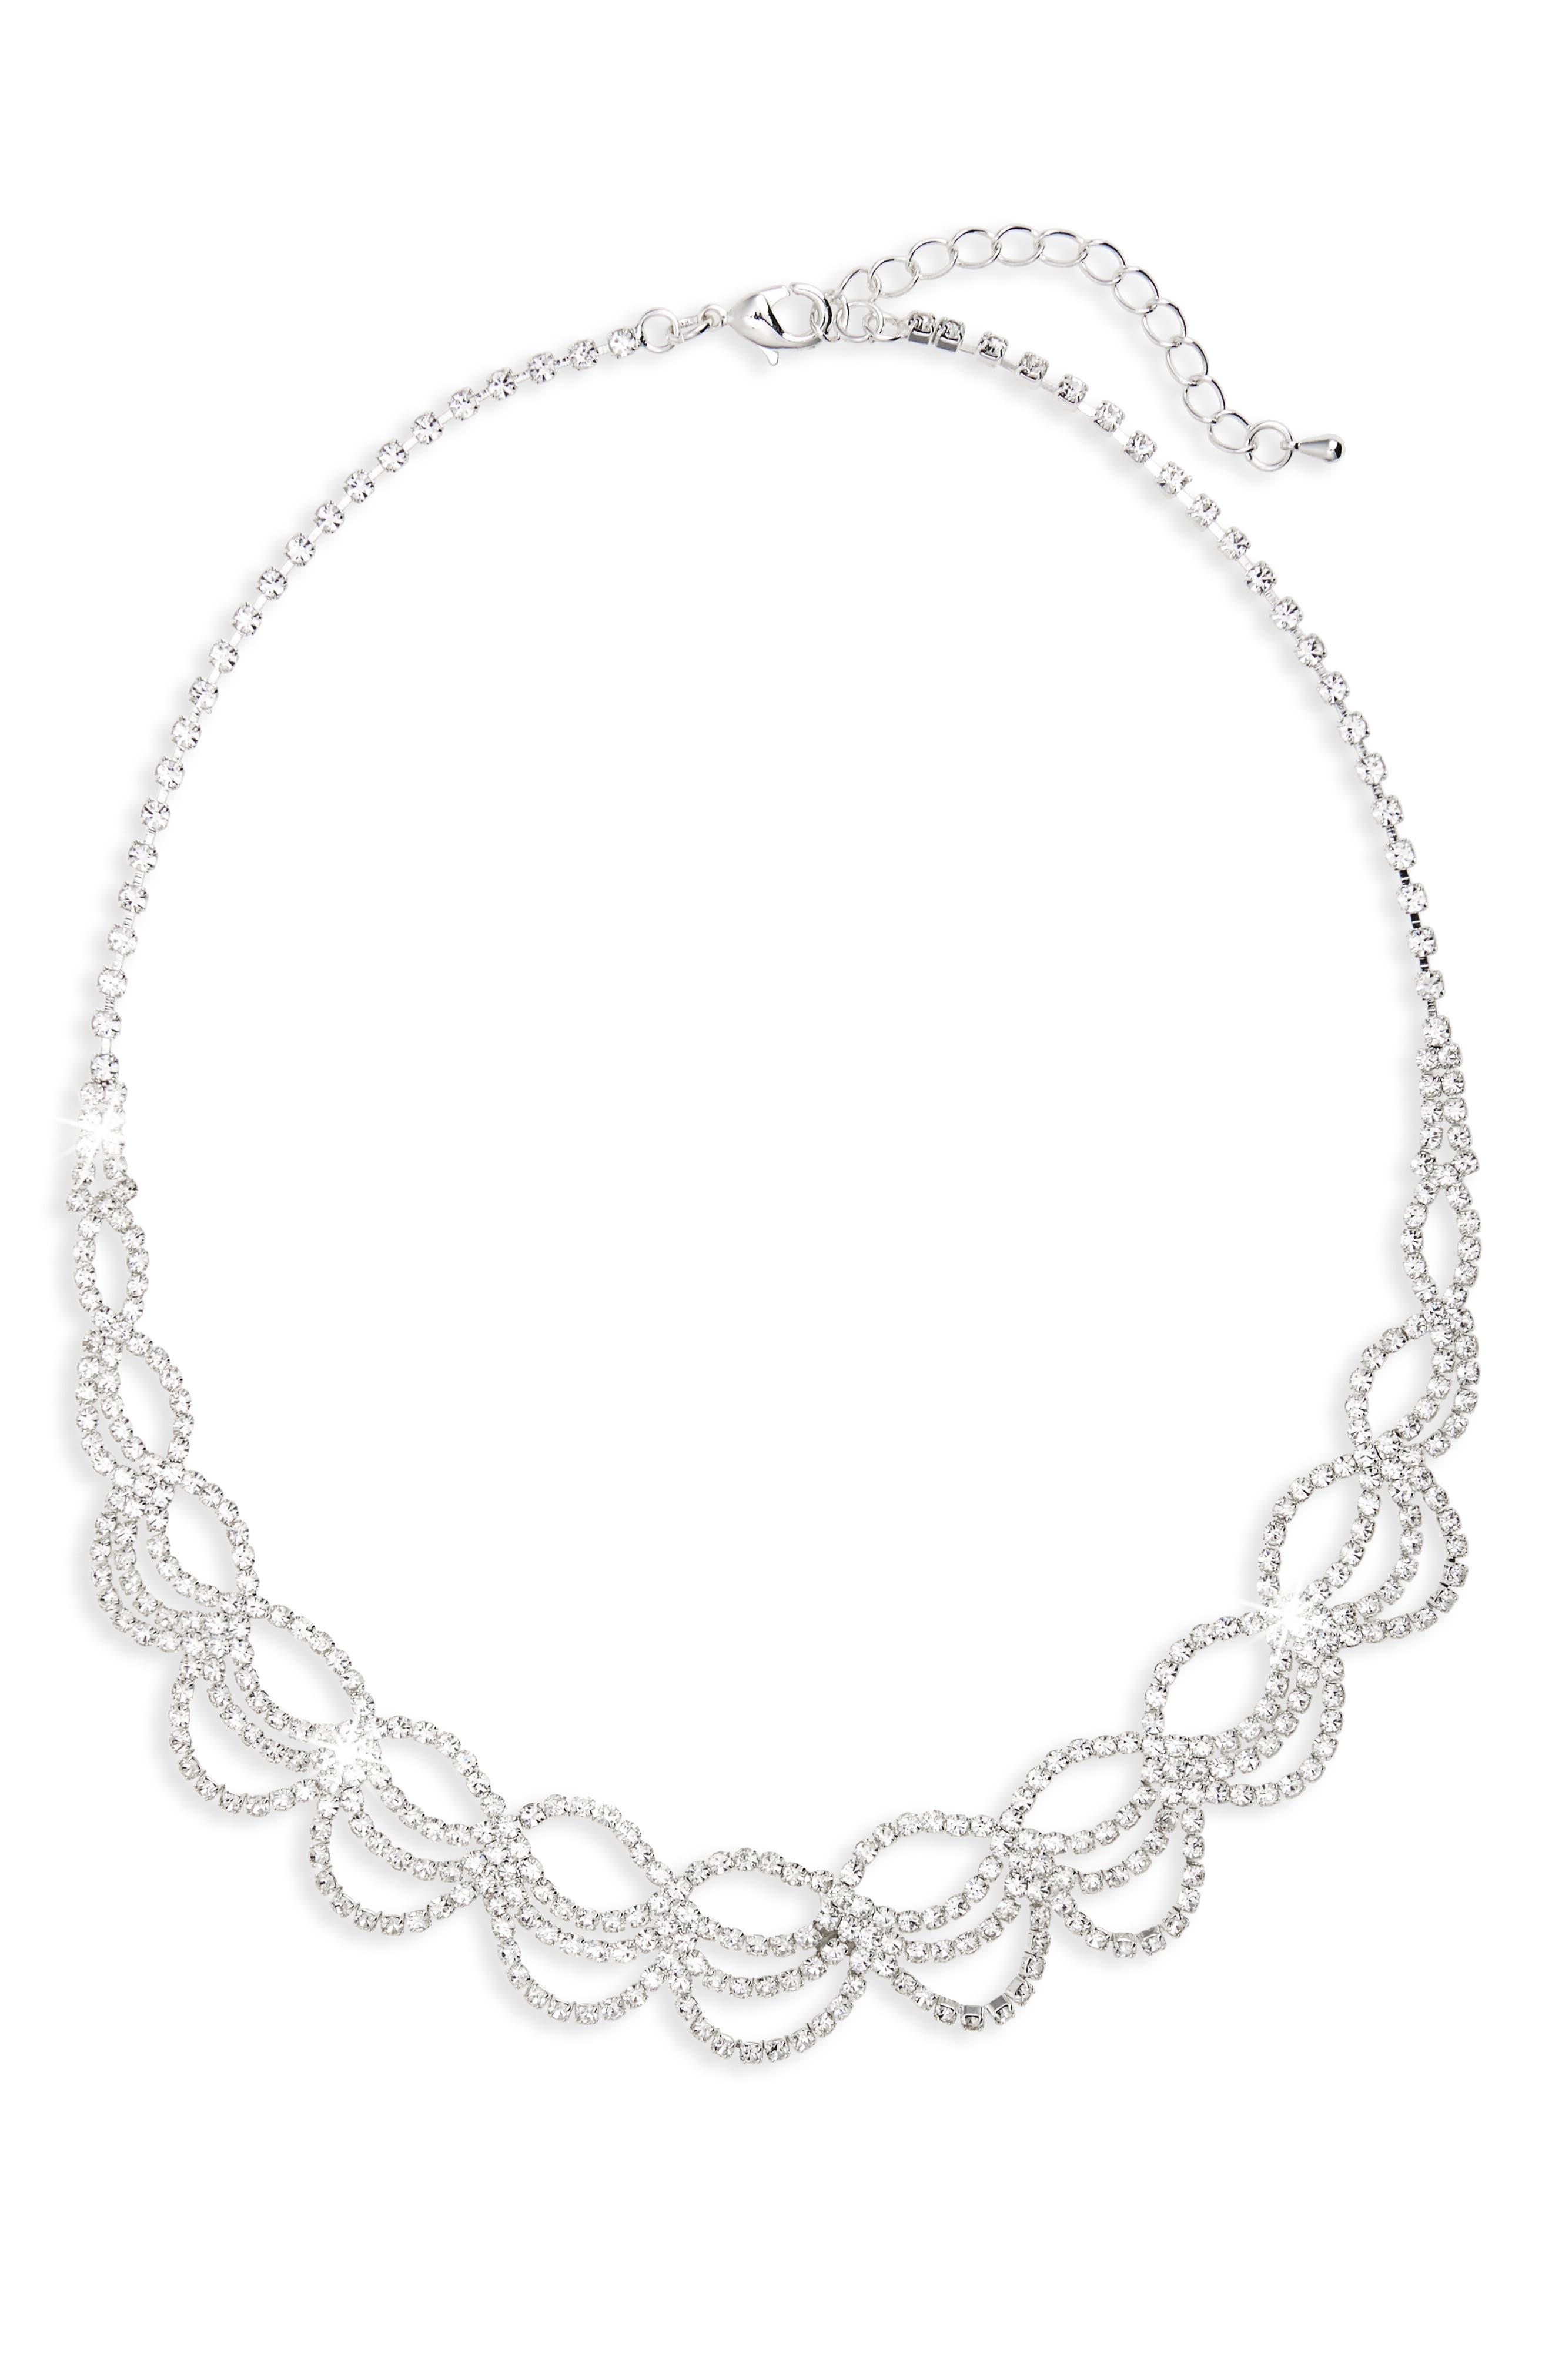 Alternate Image 1 Selected - Nina Swag Crystal Drama Collar Necklace